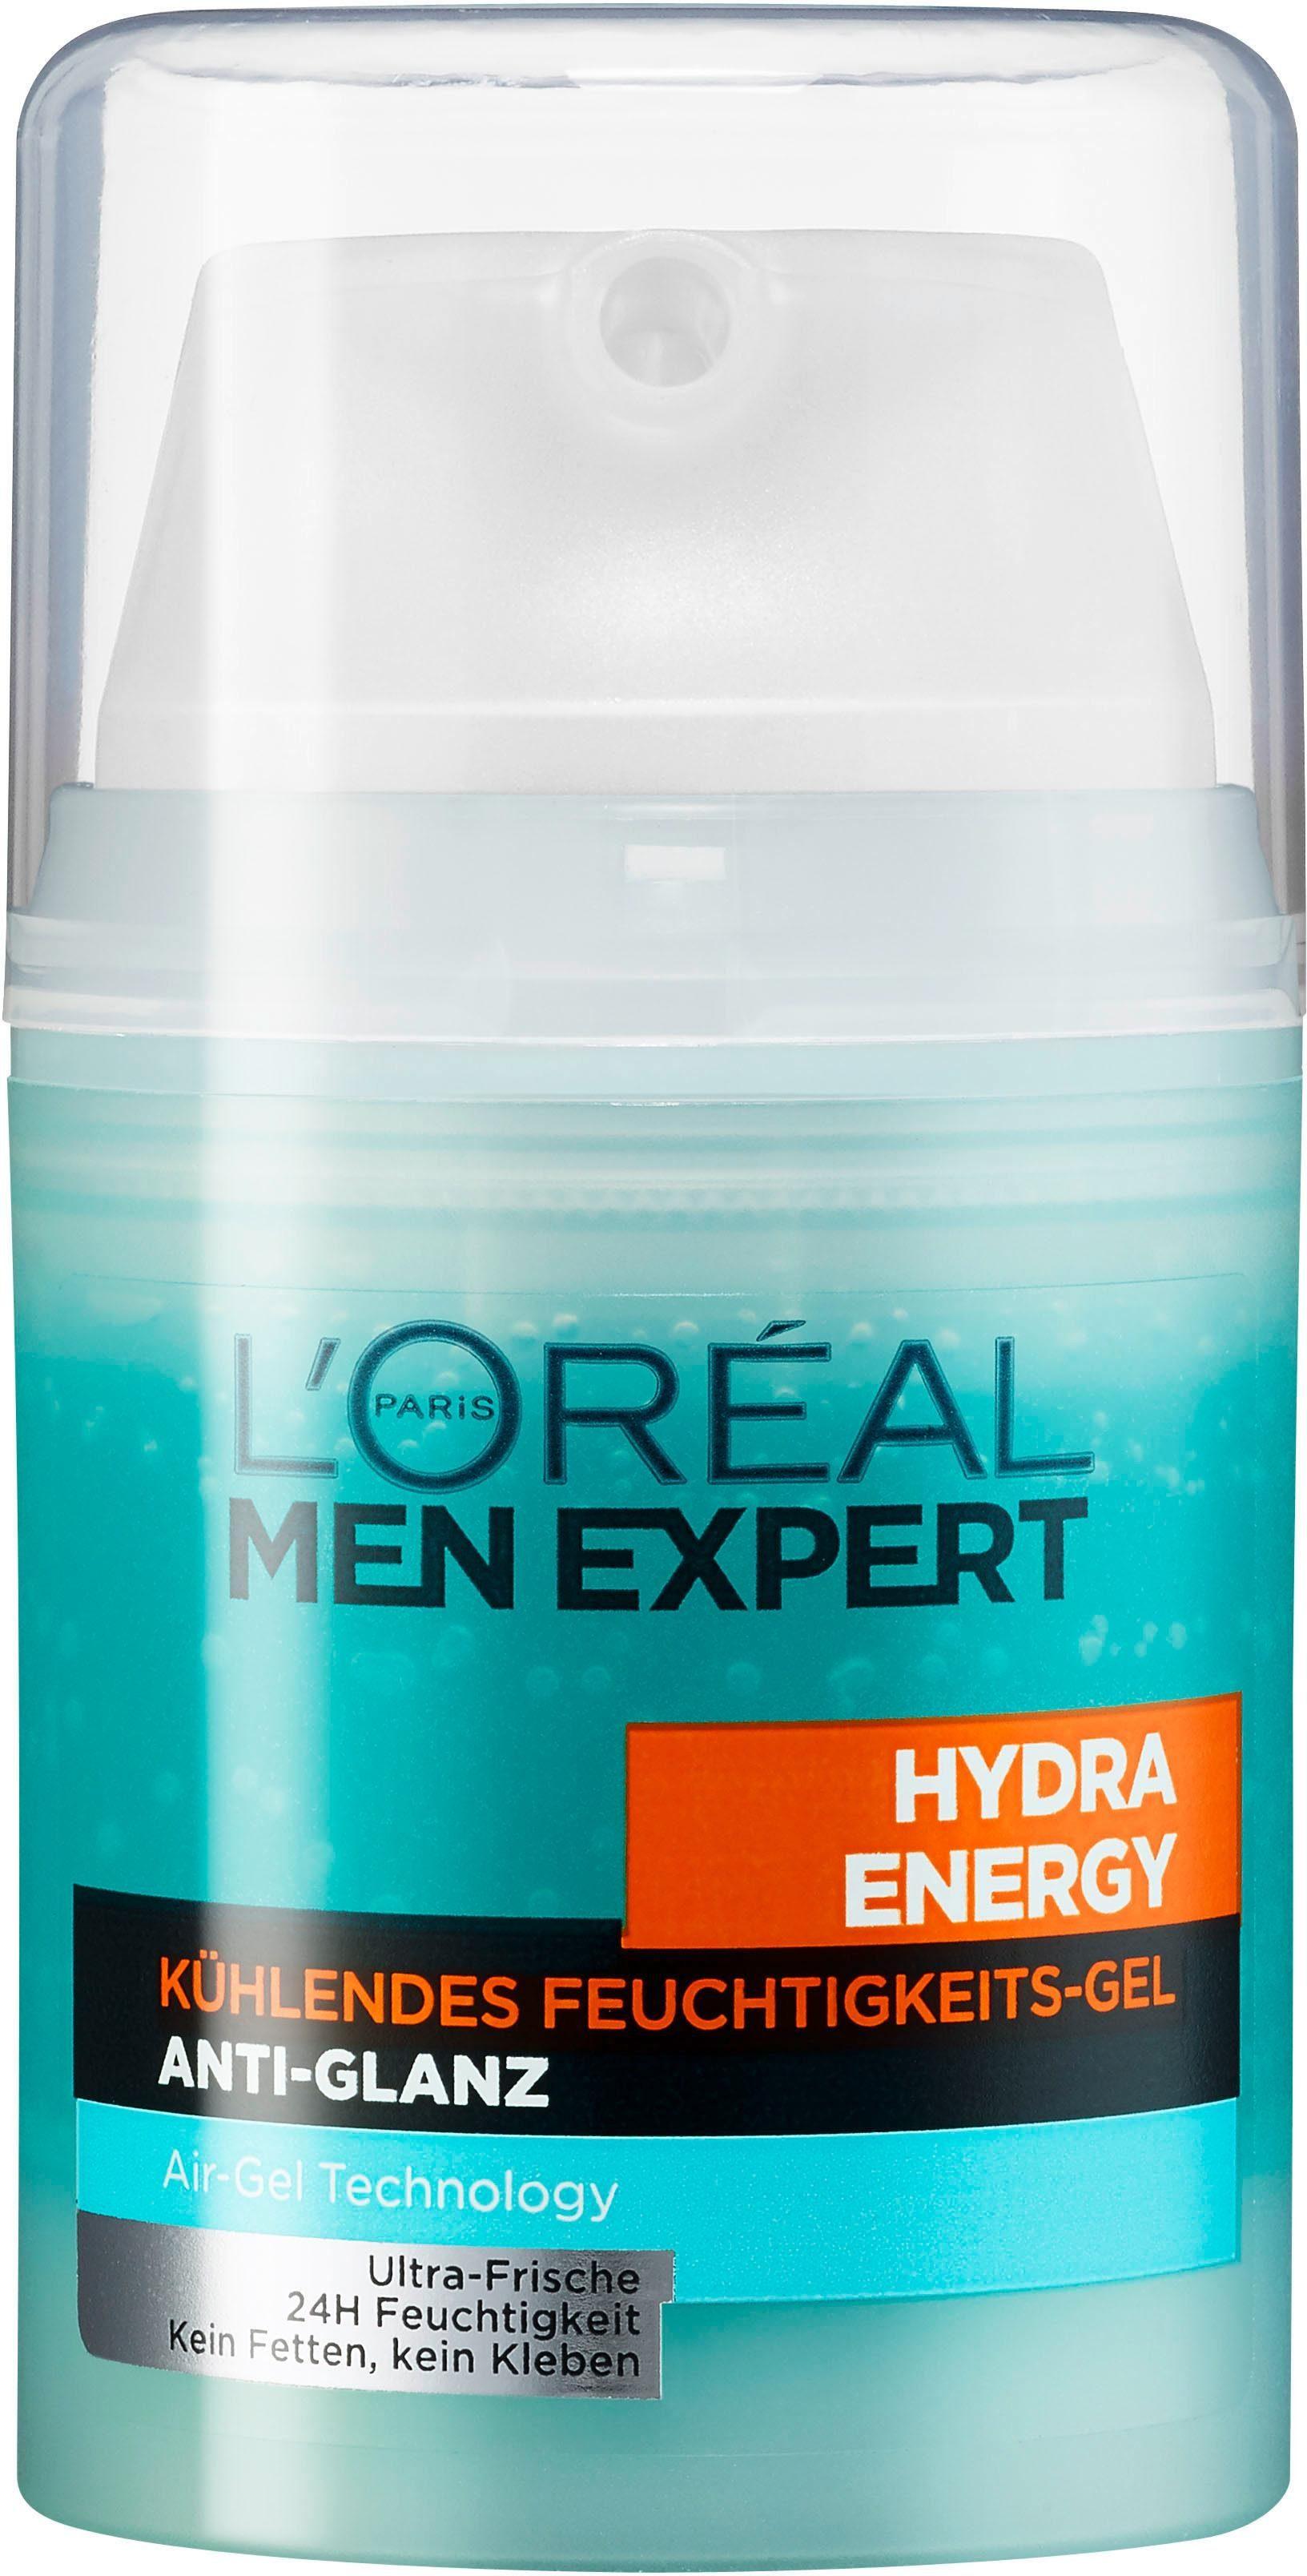 L'Oréal Paris Men Expert, »Hydra Energy Kühlendes Feuchtigkeitsgel Anti-Glanz«, Männerpflege